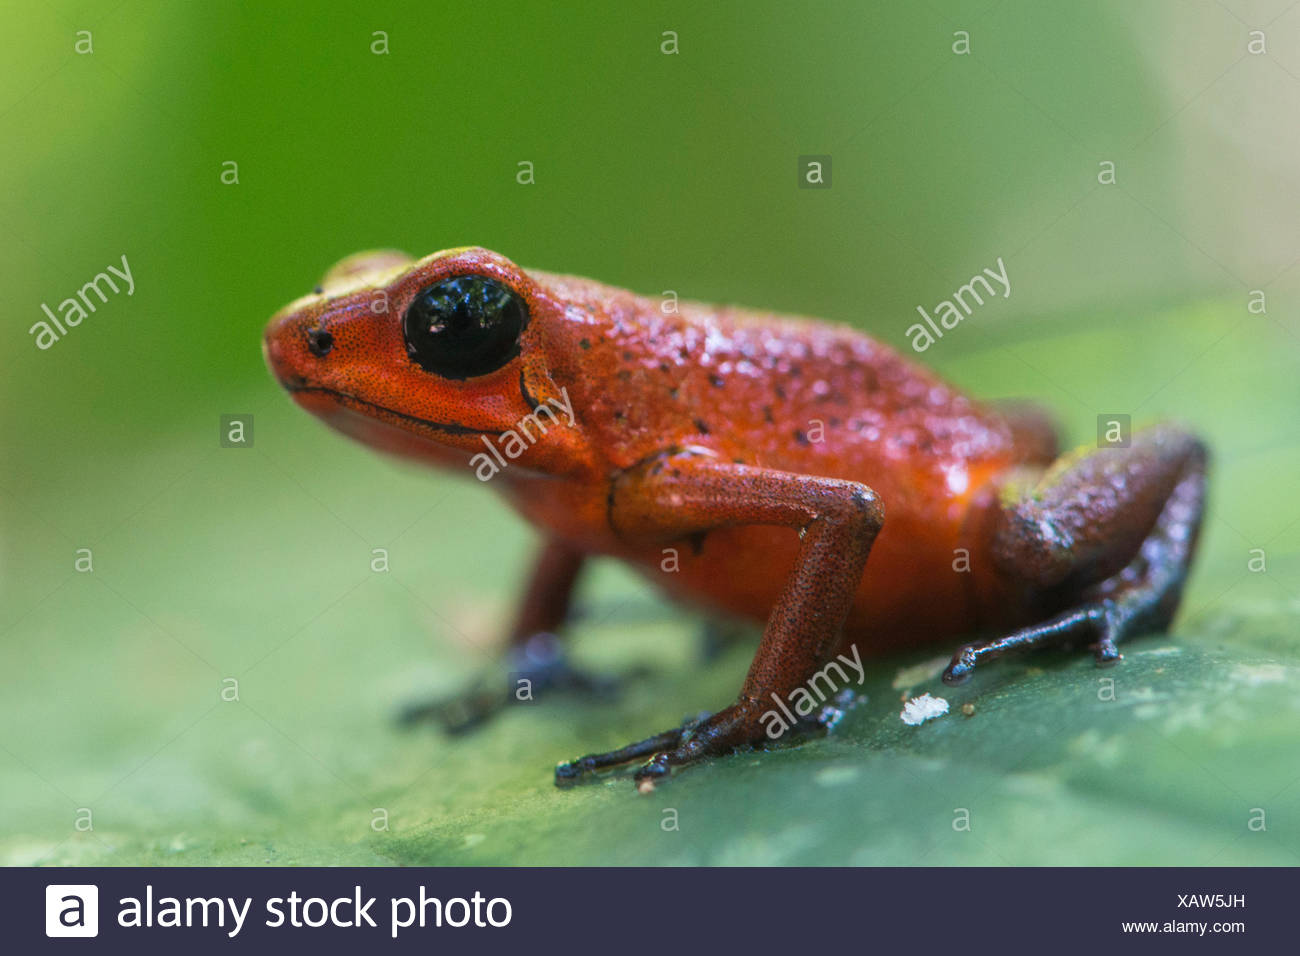 Strawberry poison-dart frog (Oophaga pumilio) sitting on leaf, Tortuguero National Park, Costa Rica - Stock Image